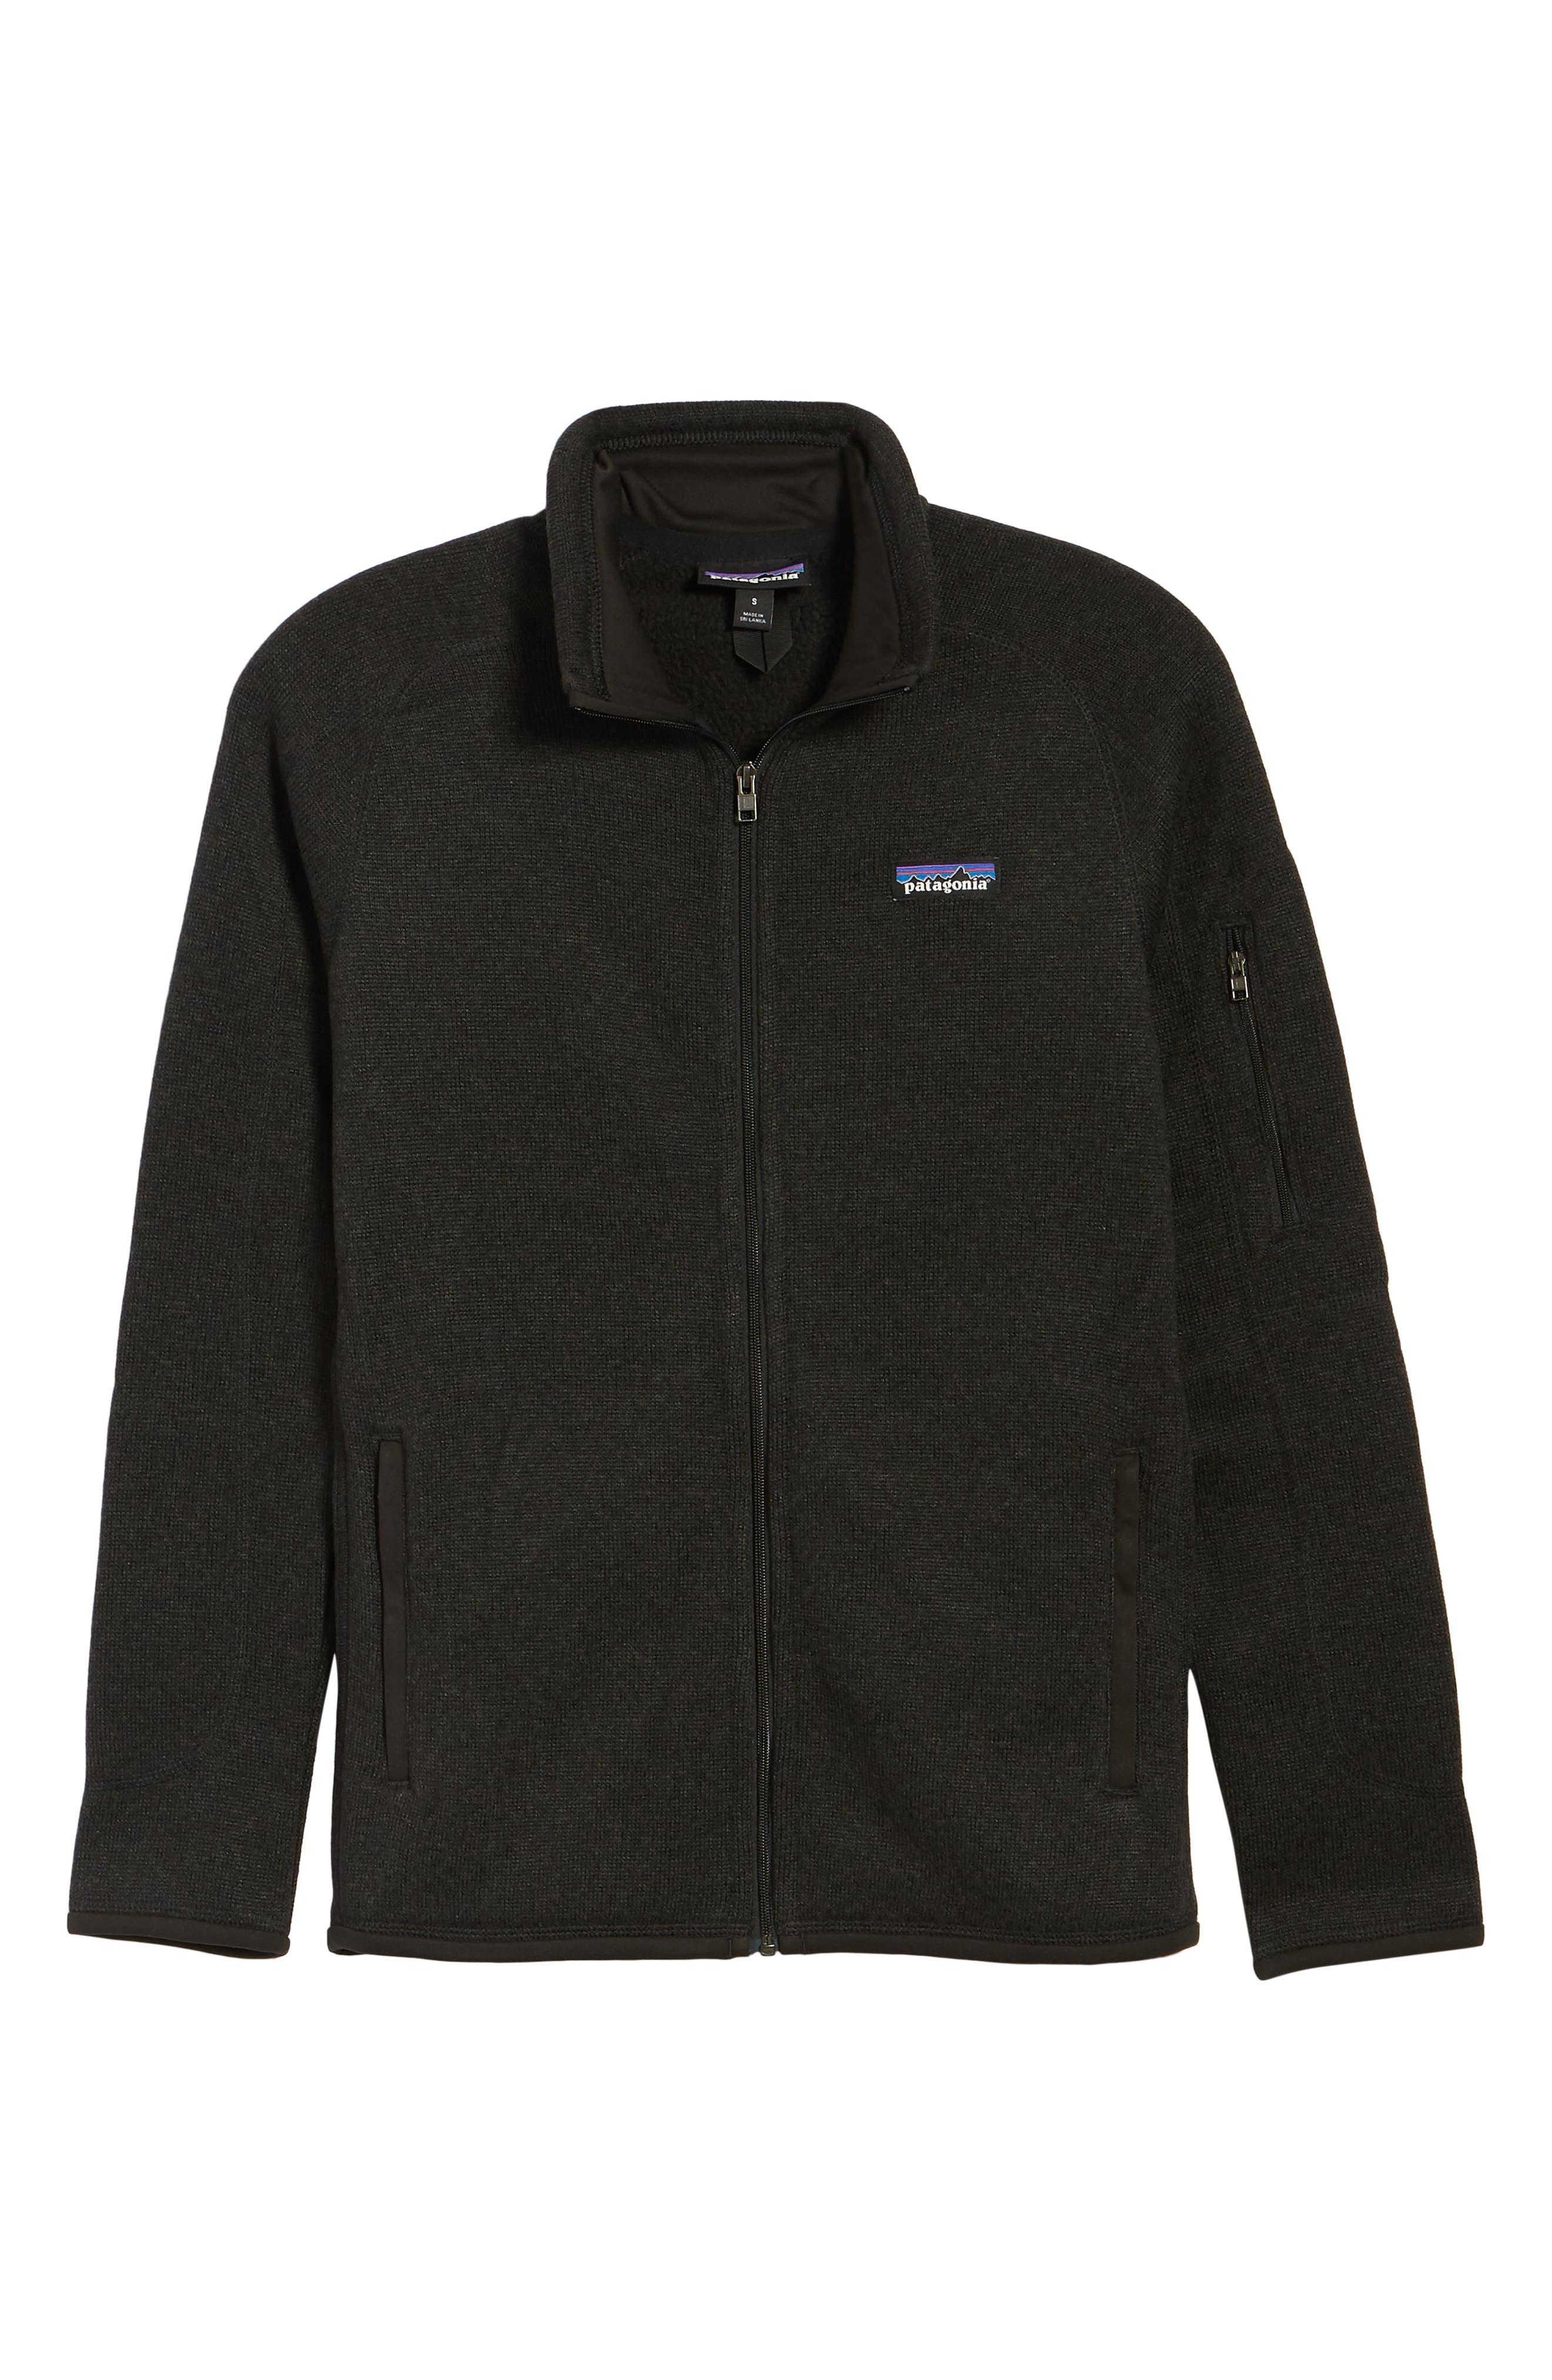 PATAGONIA, 'BetterSweater' Jacket, Alternate thumbnail 2, color, BLACK